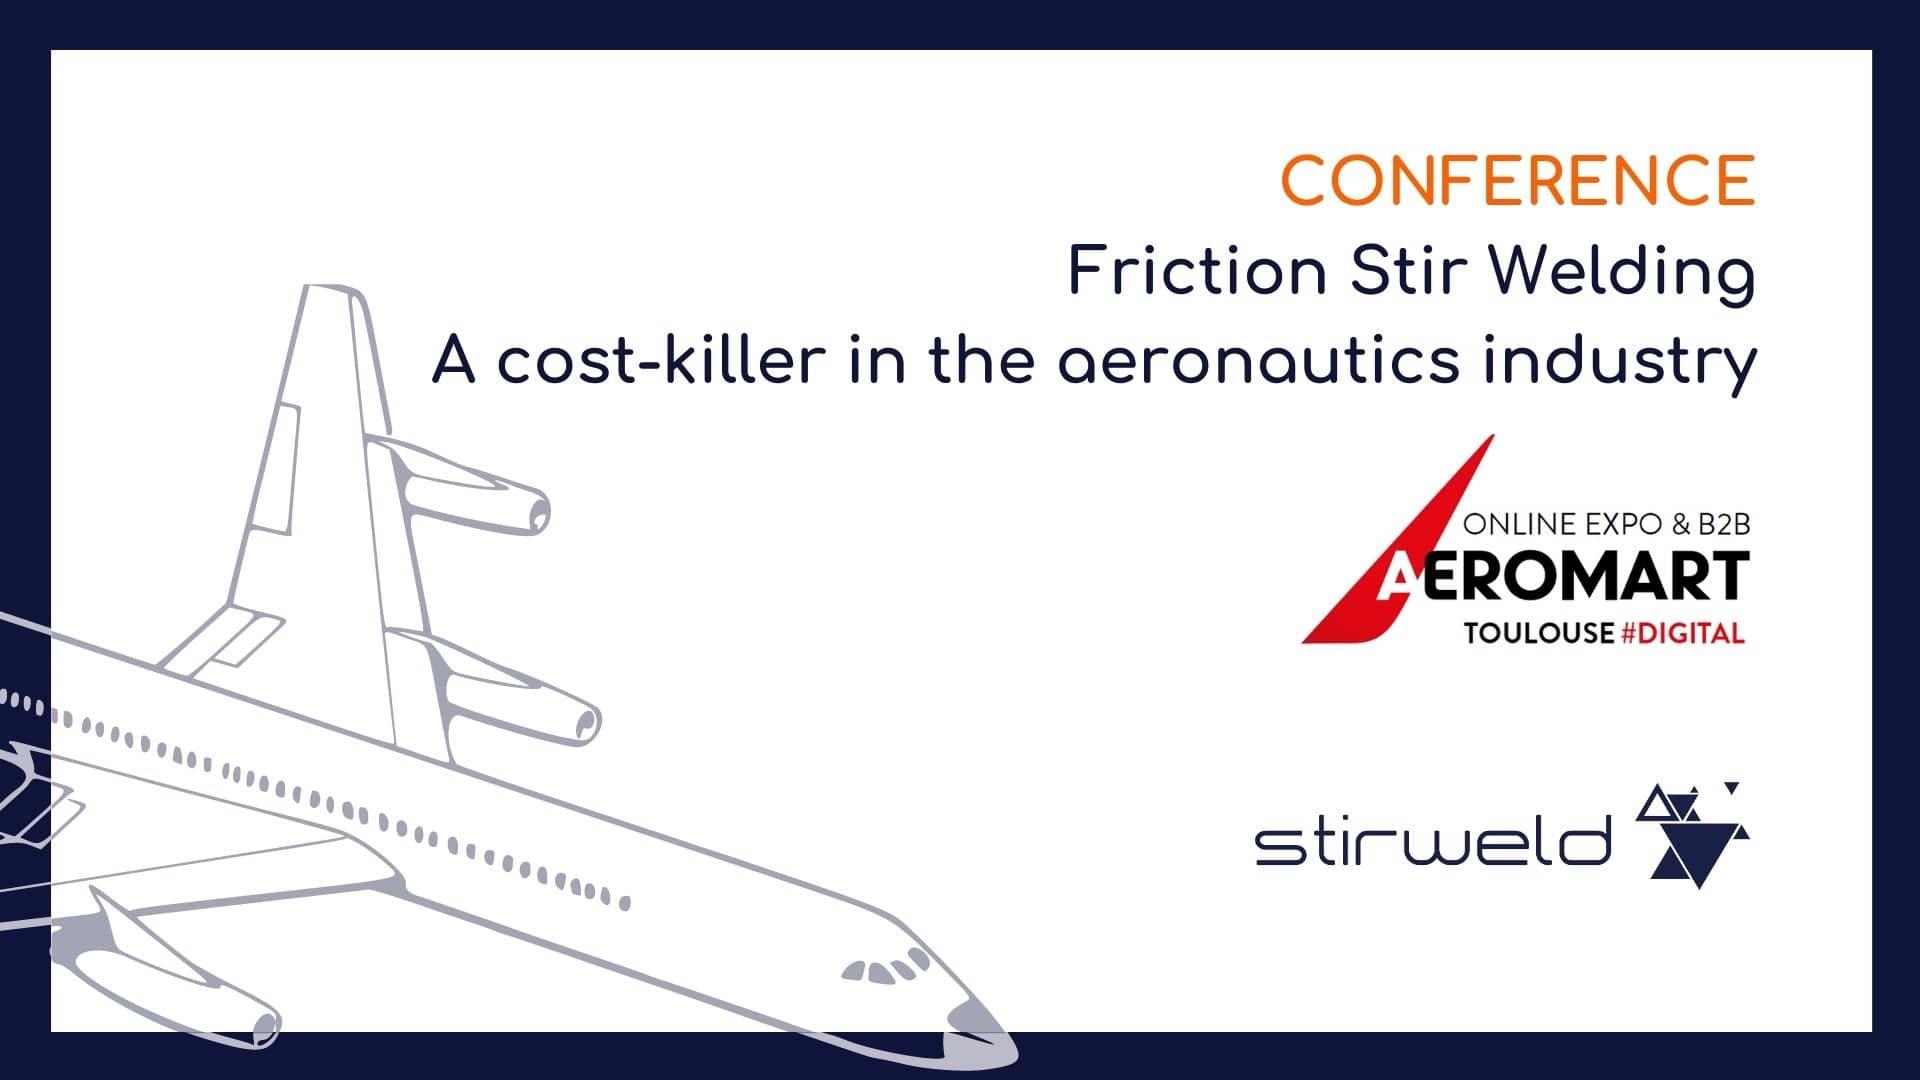 FSW aeronatics industry